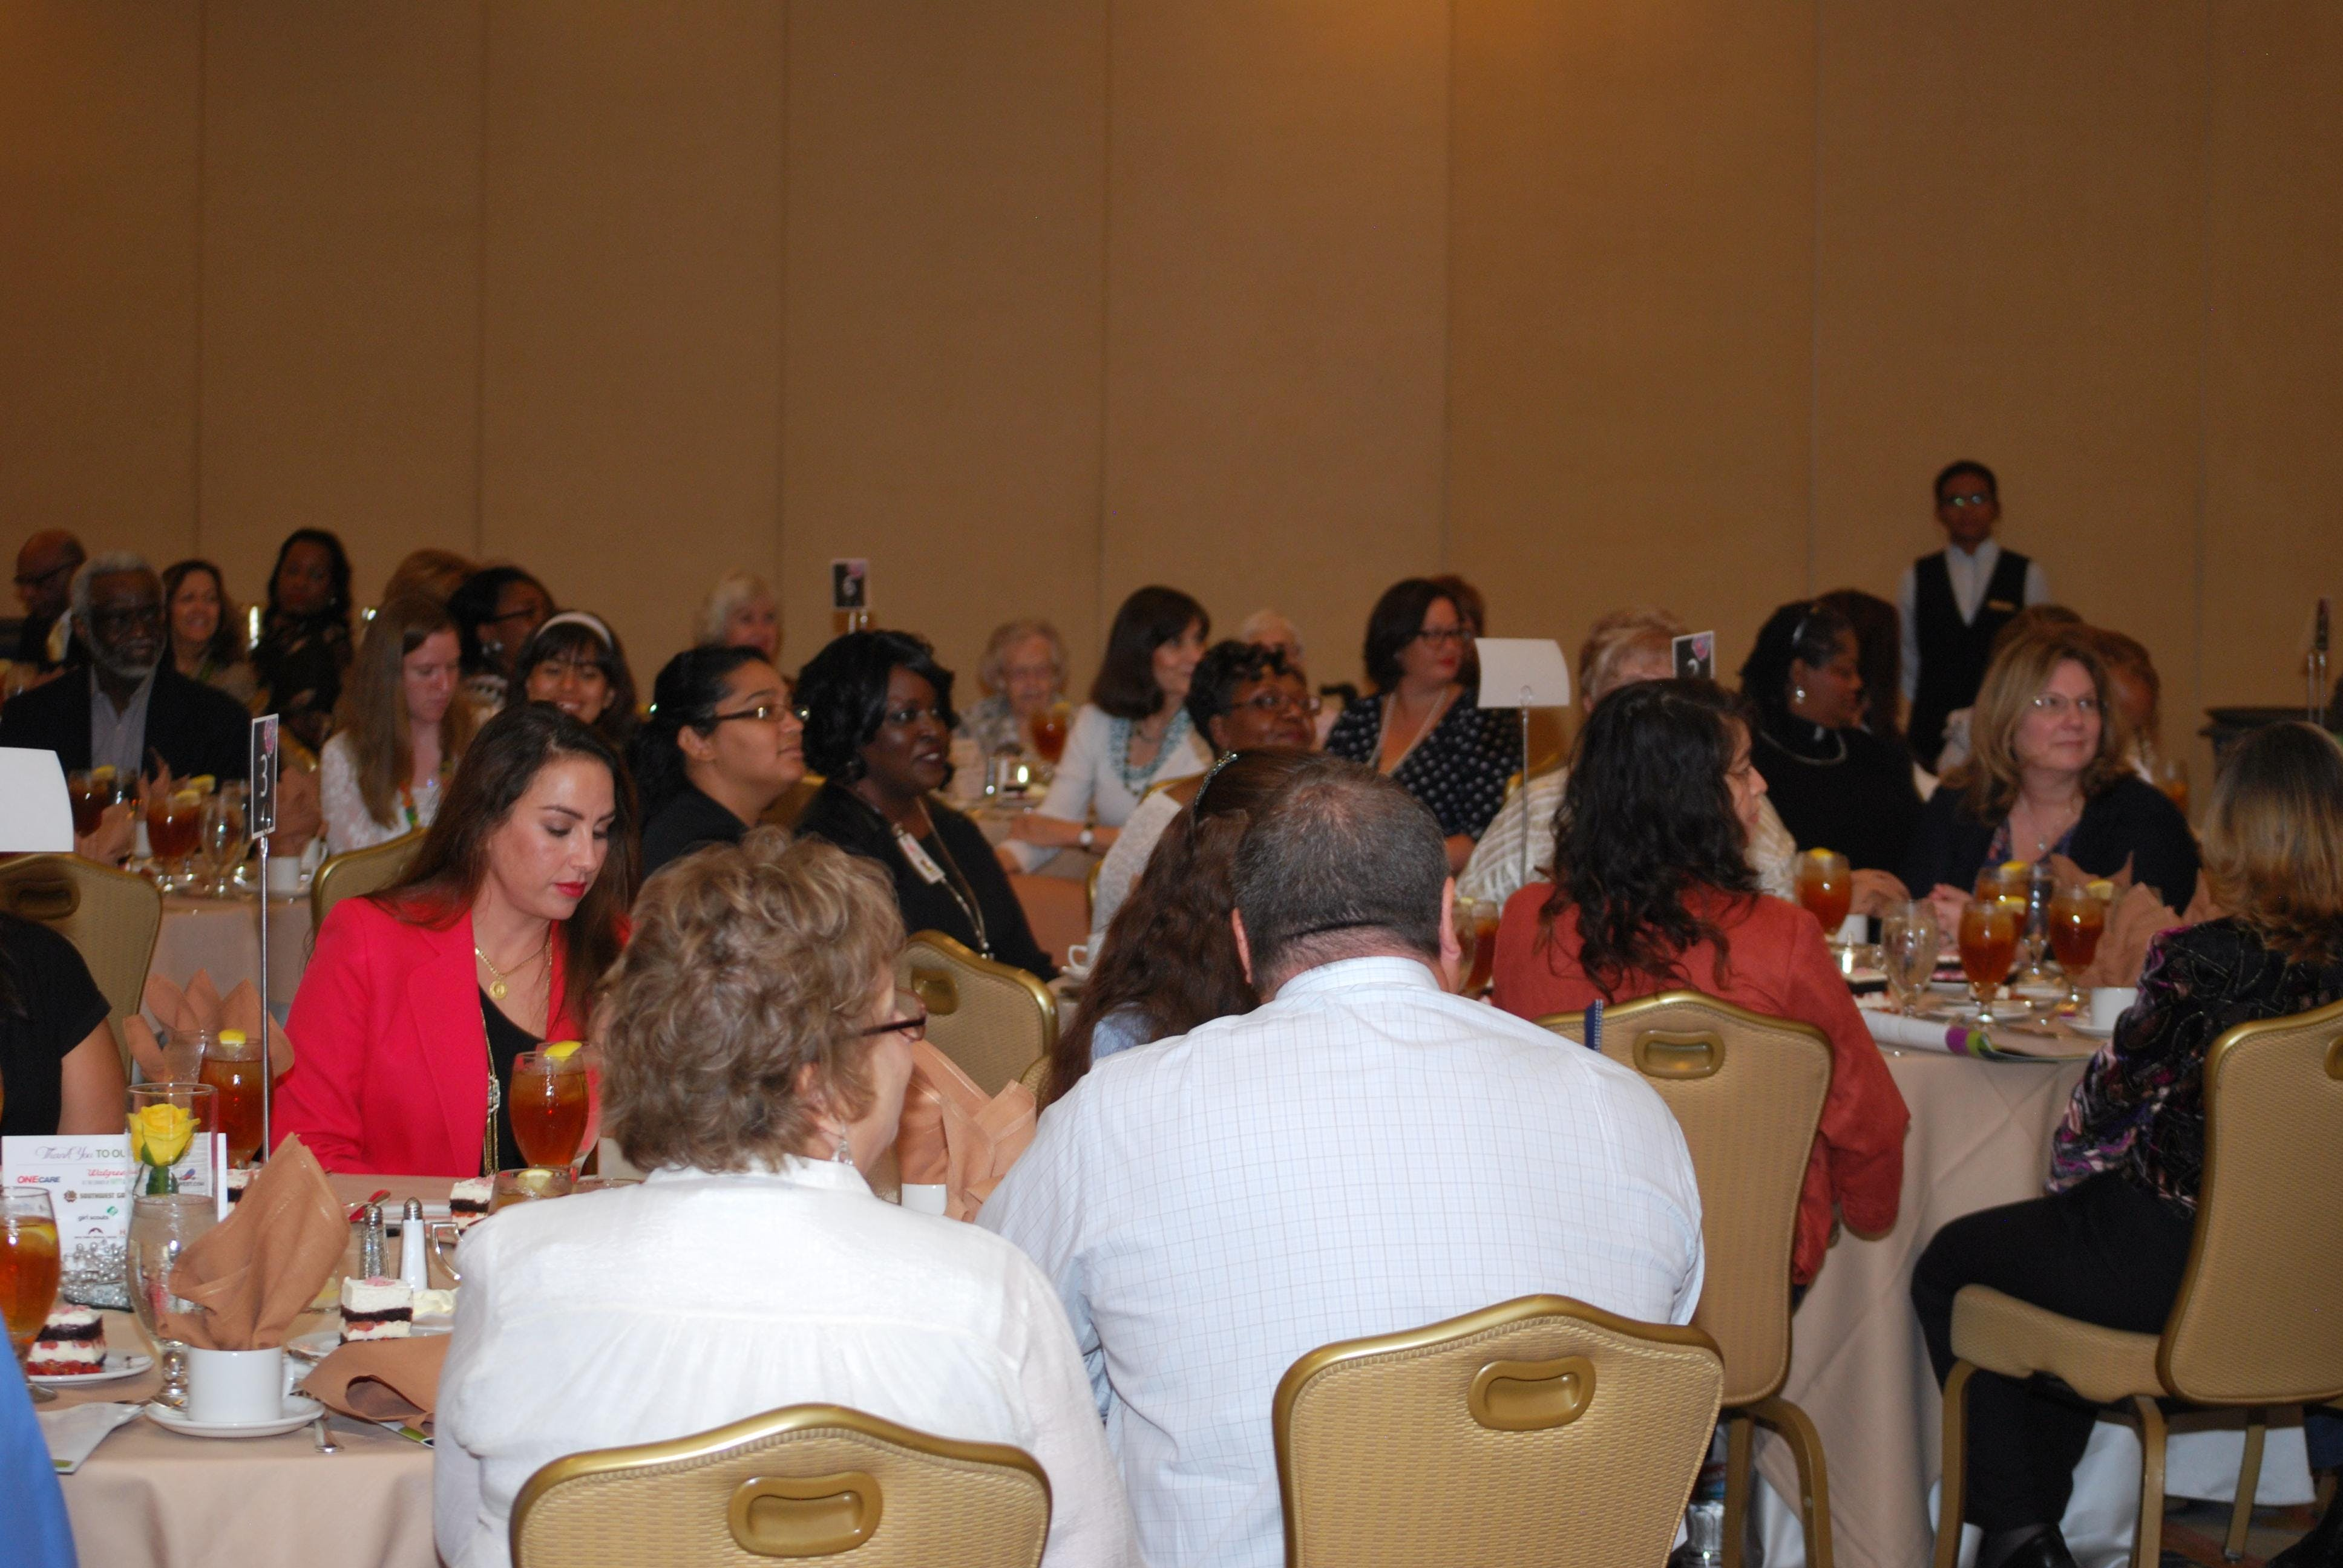 7th Annual Senior Awards Luncheon